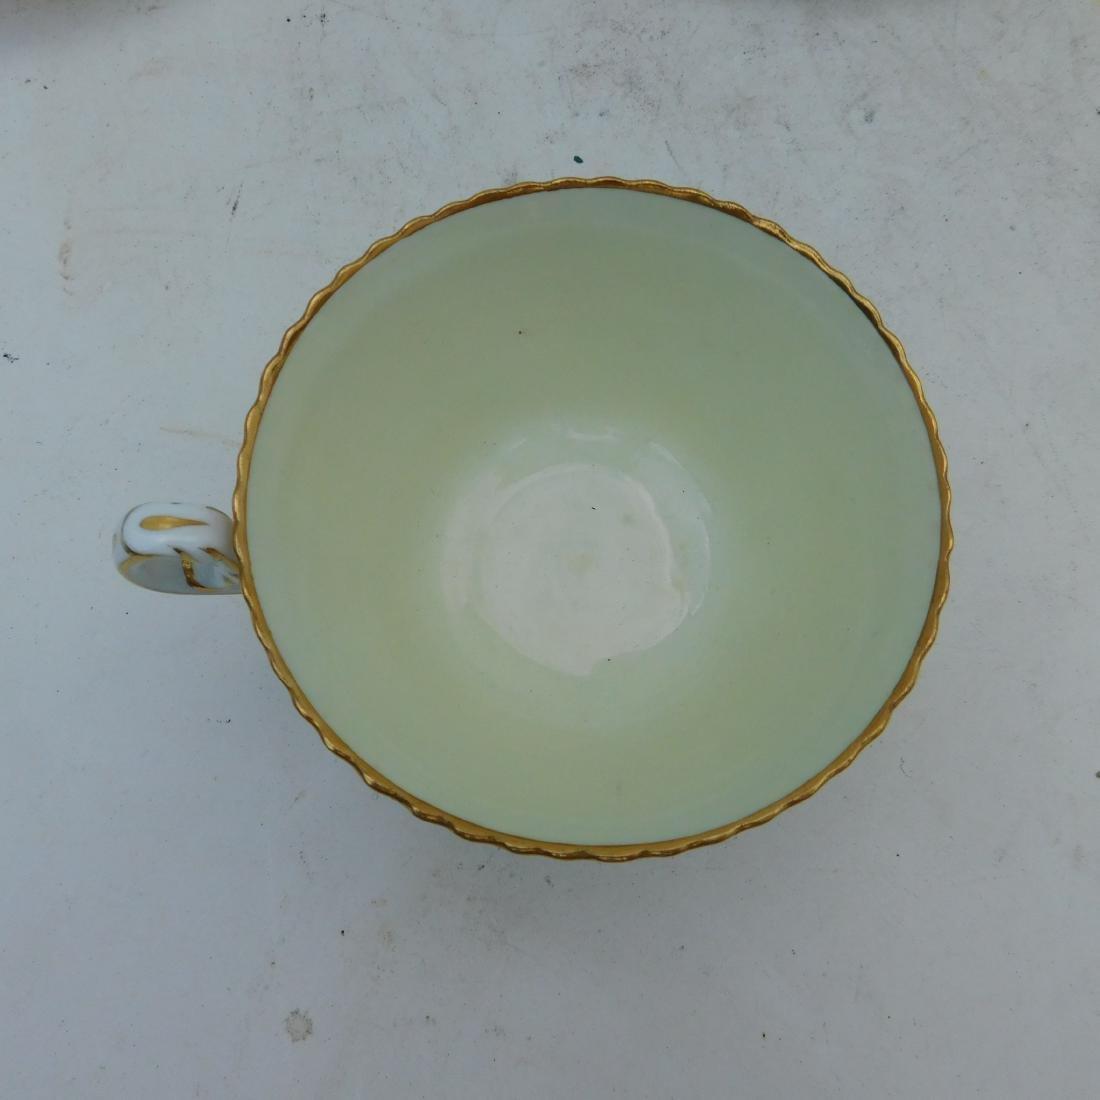 Lot of 10 SPODE Teacups - 4